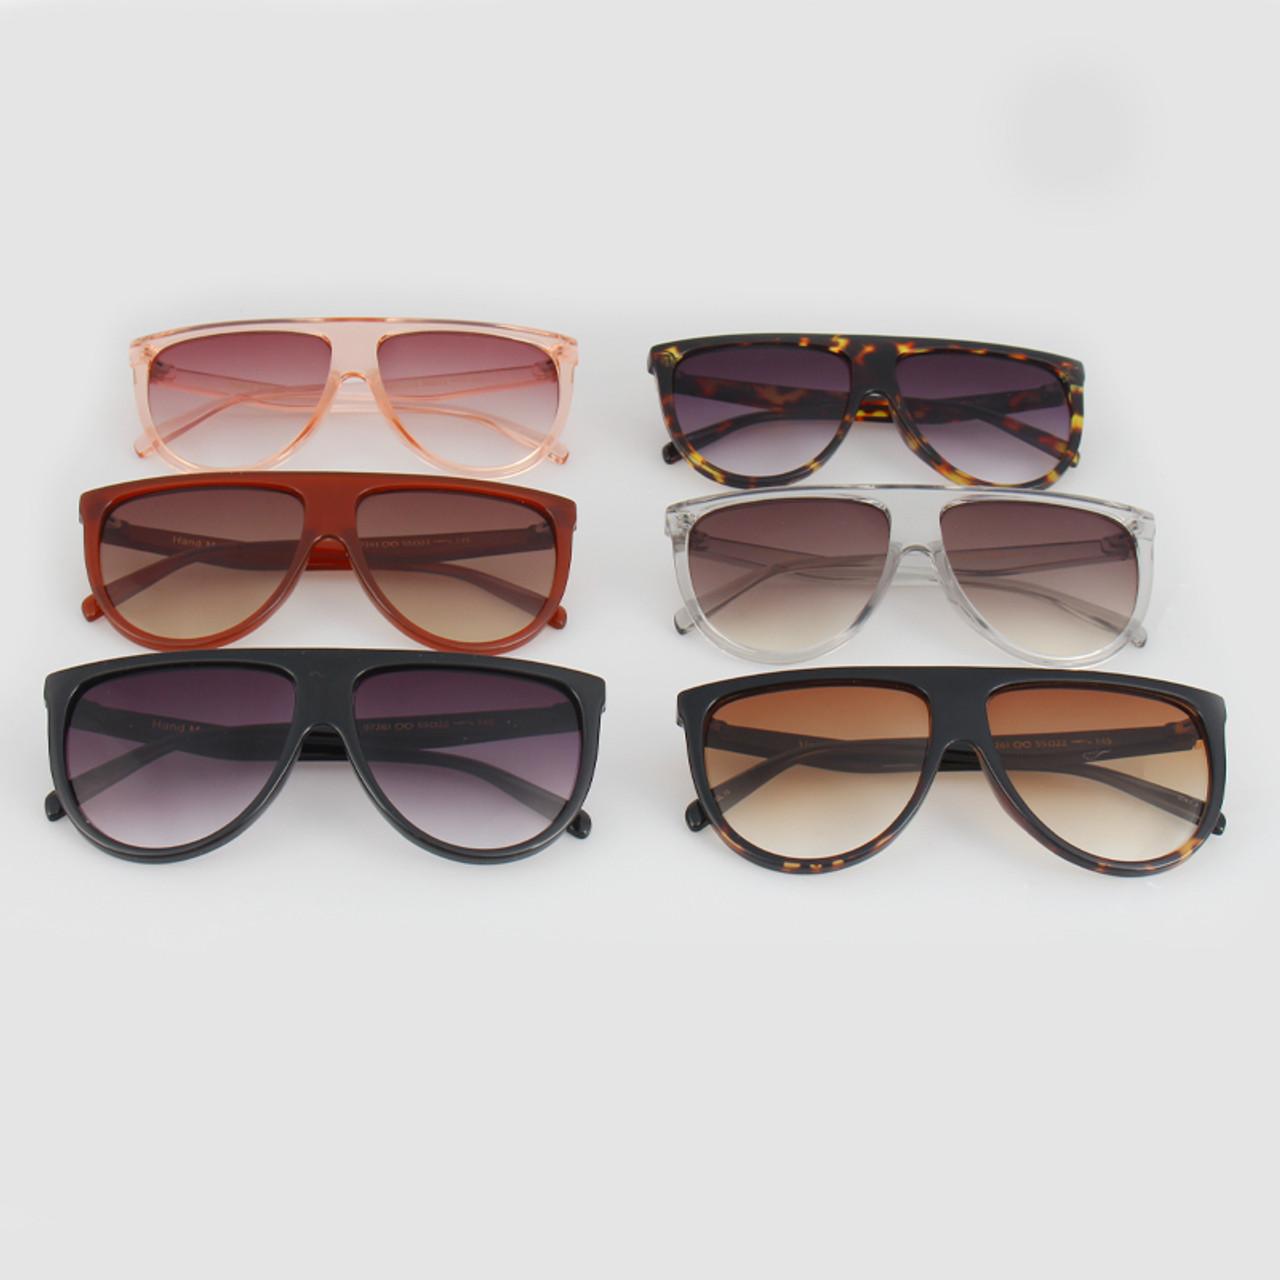 0099e58738 ... RSSELDN New Black Clear Oversized Square Sunglasses Women Gradient 2018  Summer Style Classic Women Sun glasses ...